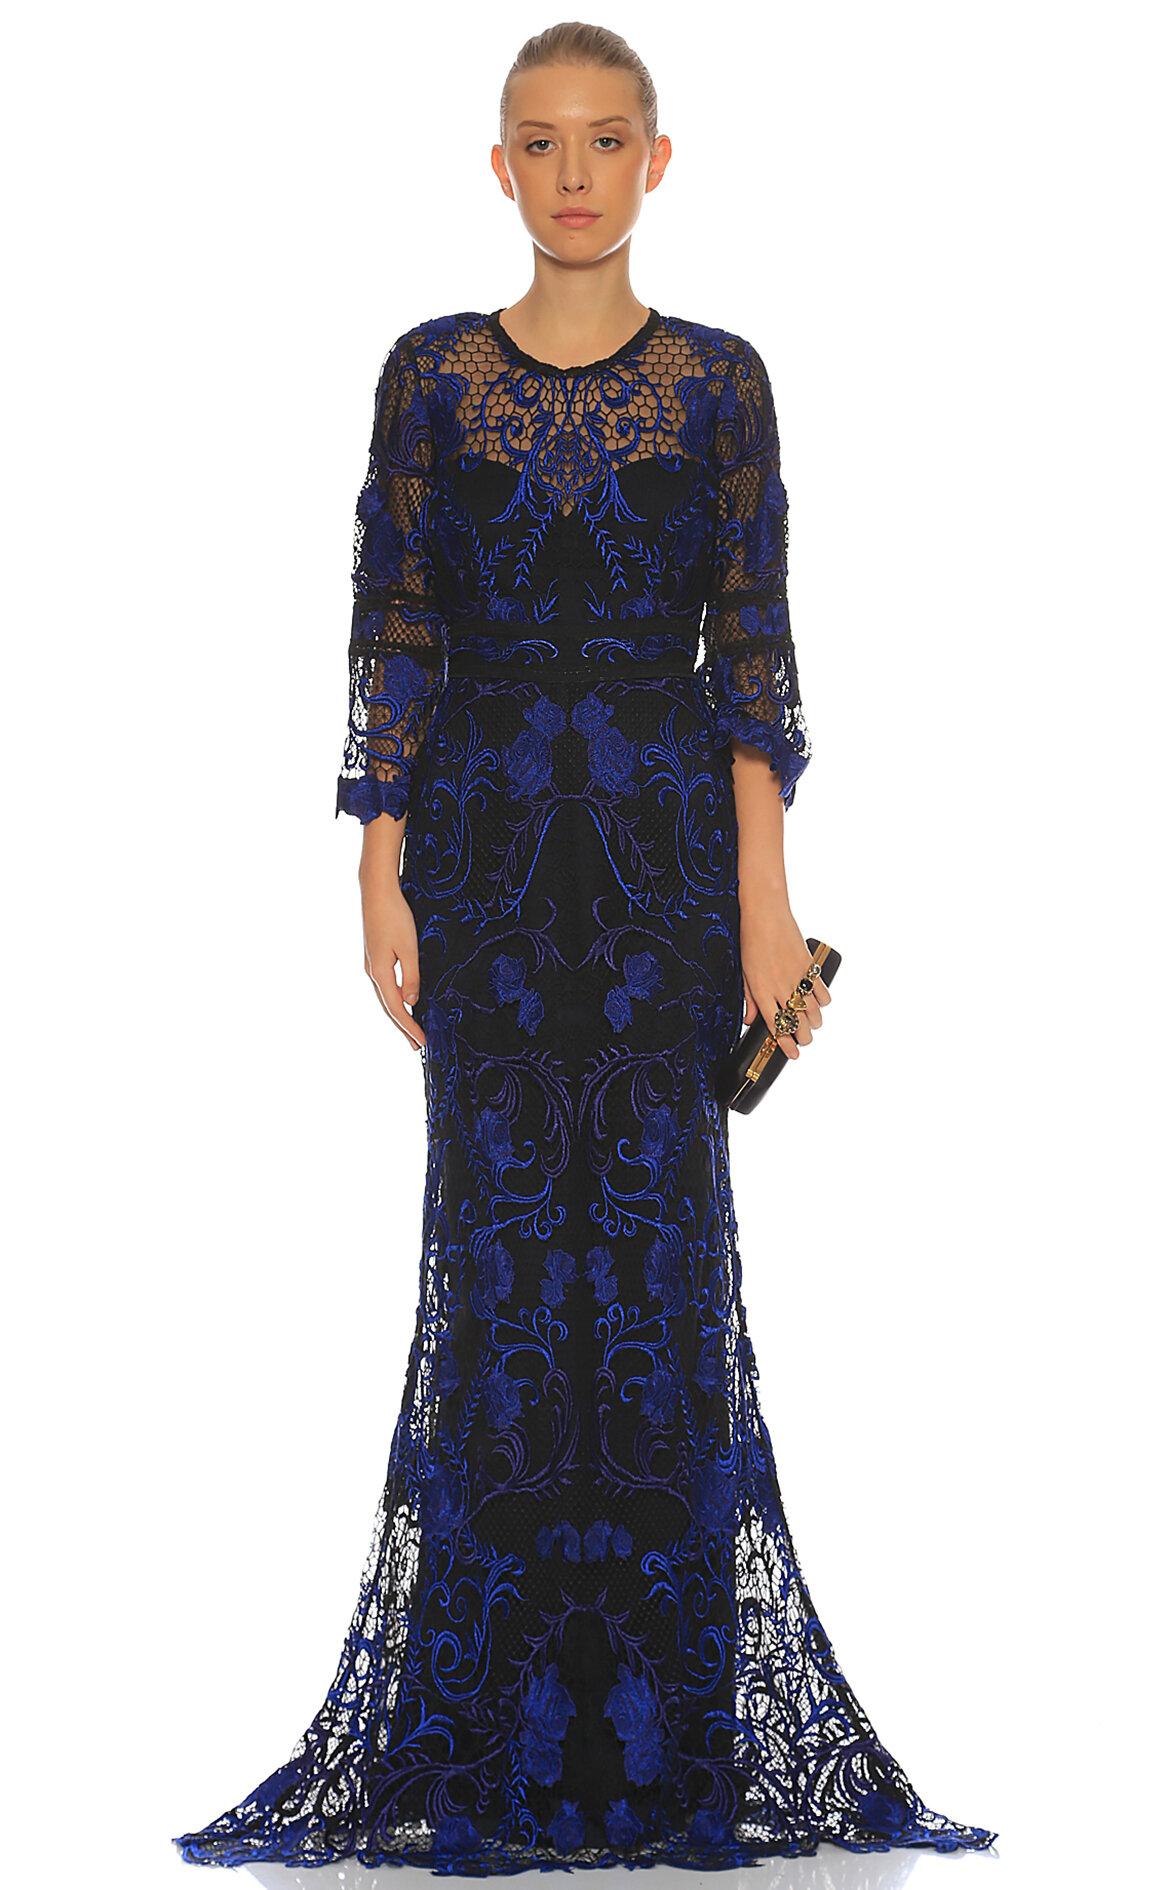 Marchesa Notte-Marchesa Notte Dantel İşlemeli Gece Mavisi Uzun Gece Elbisesi